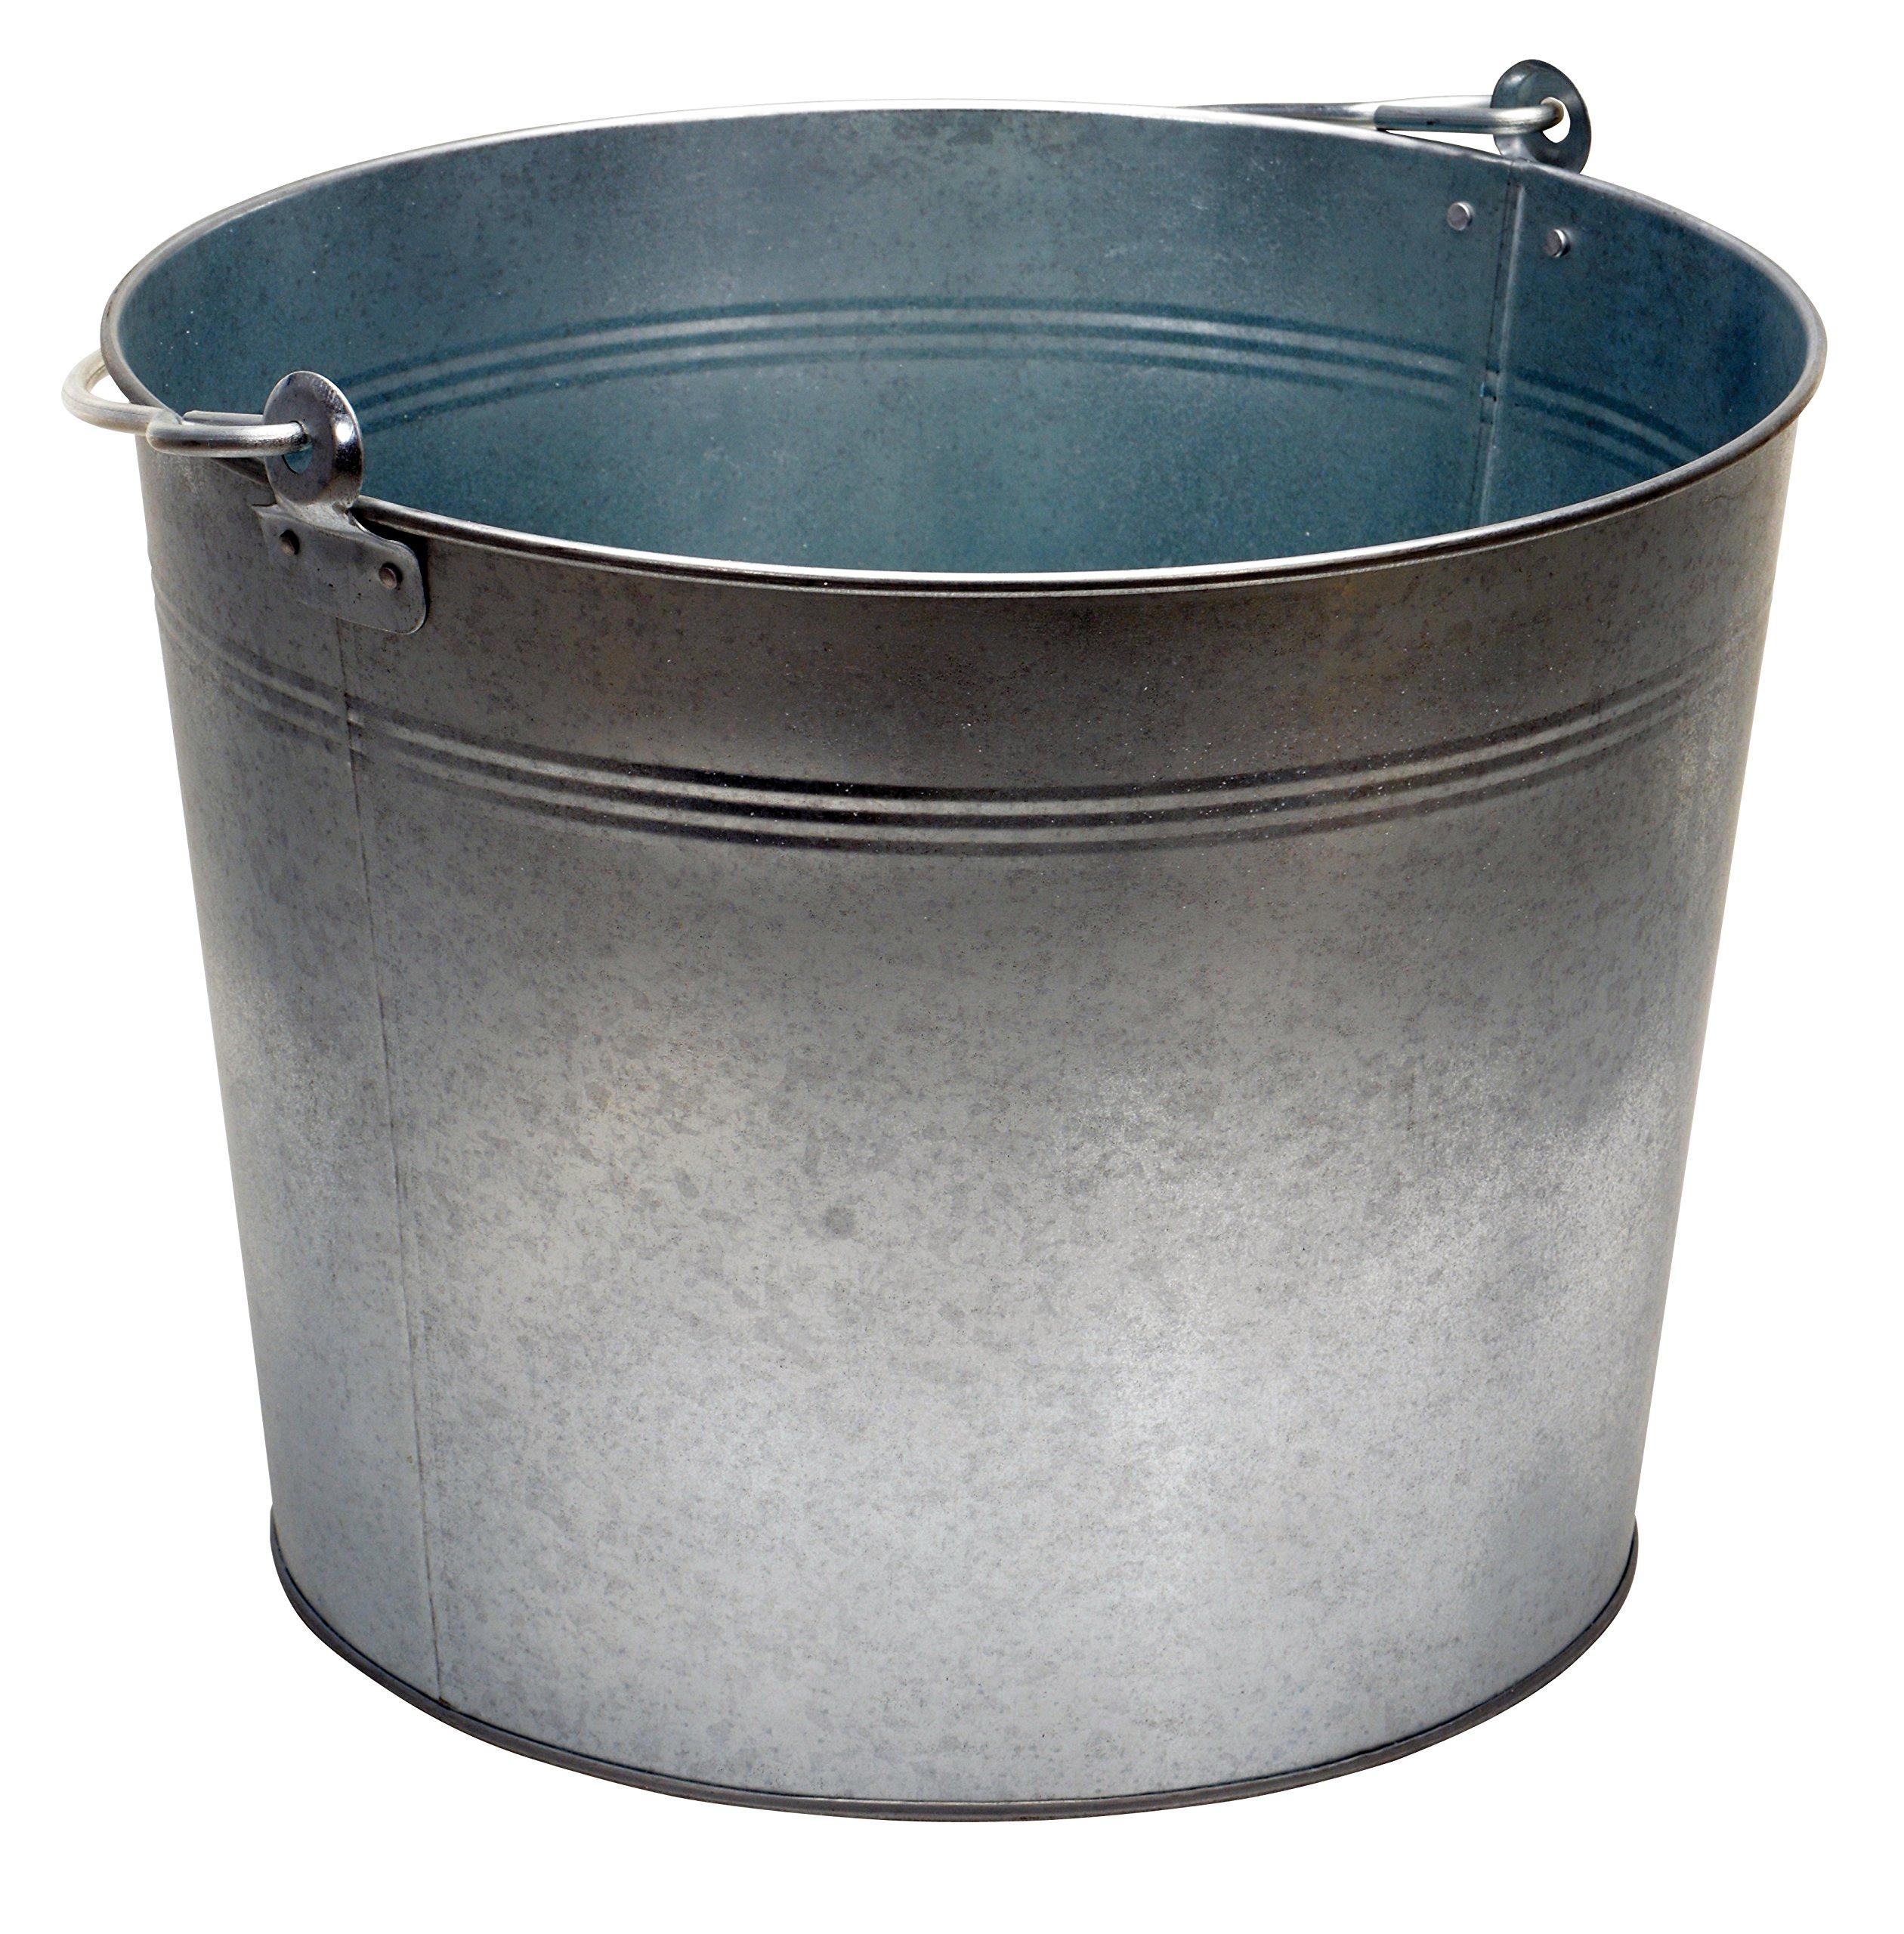 Vestil BKT-GAL-500 Galvanized Steel Bucket, 10-3/4'' Depth, 5 gallon, 44 pound Capacity